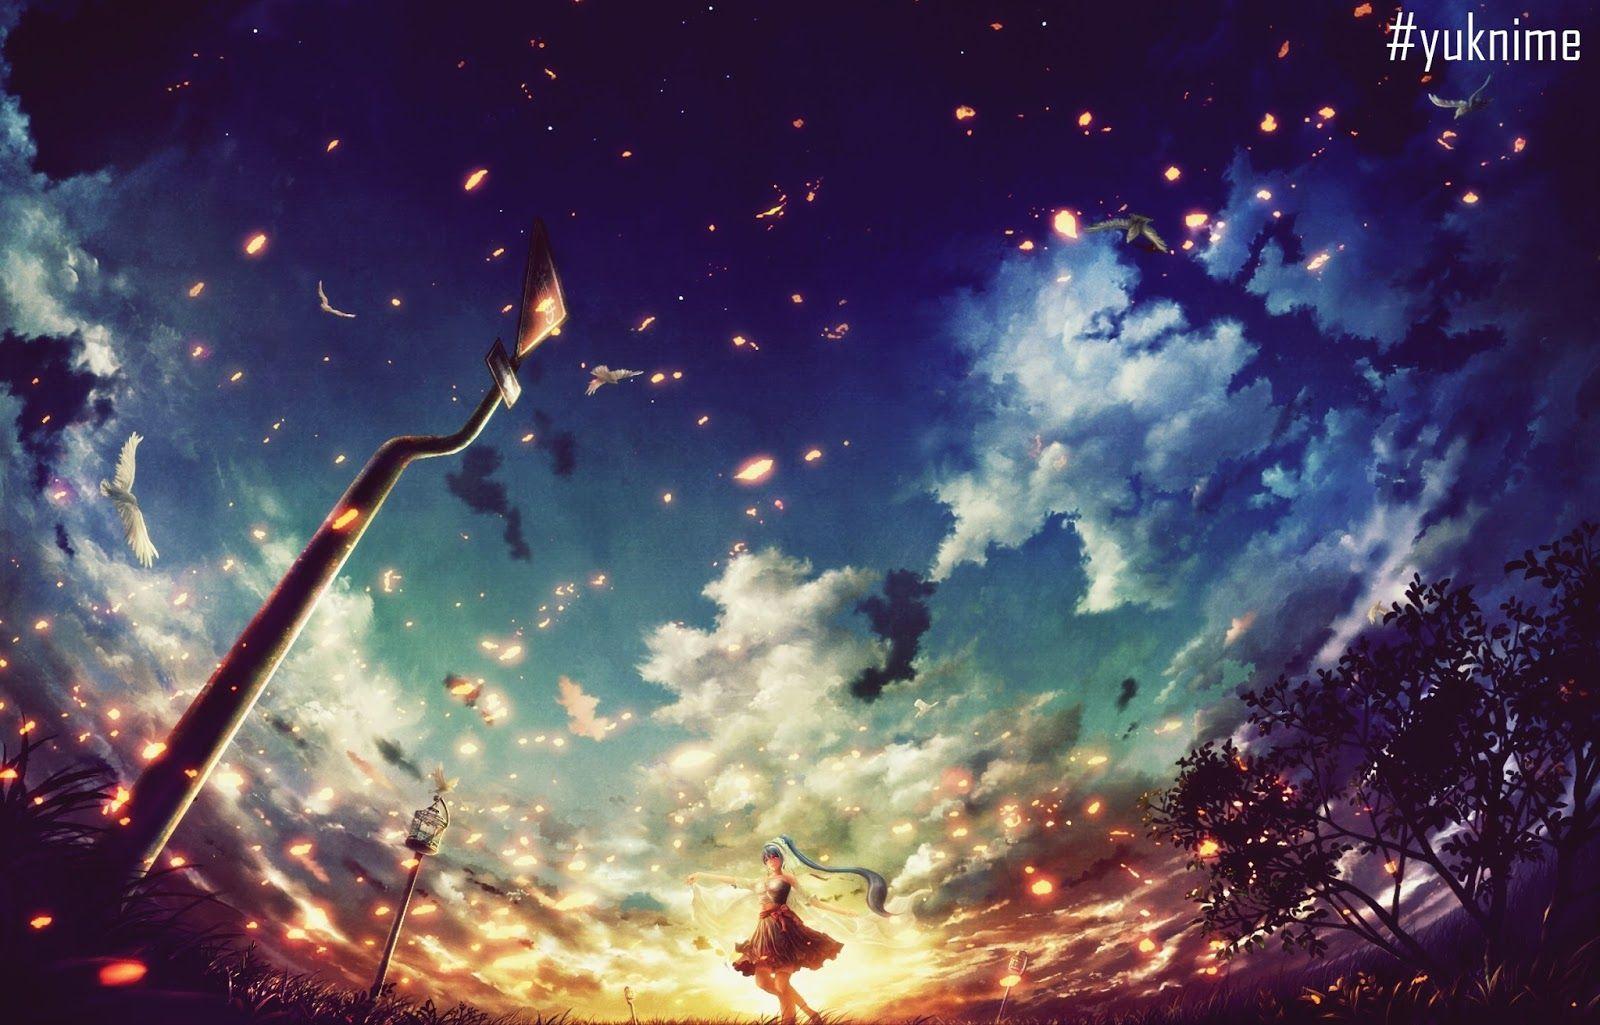 Kumpulan Gambar Keren Yuknime 02 Gambar, Gambar anime